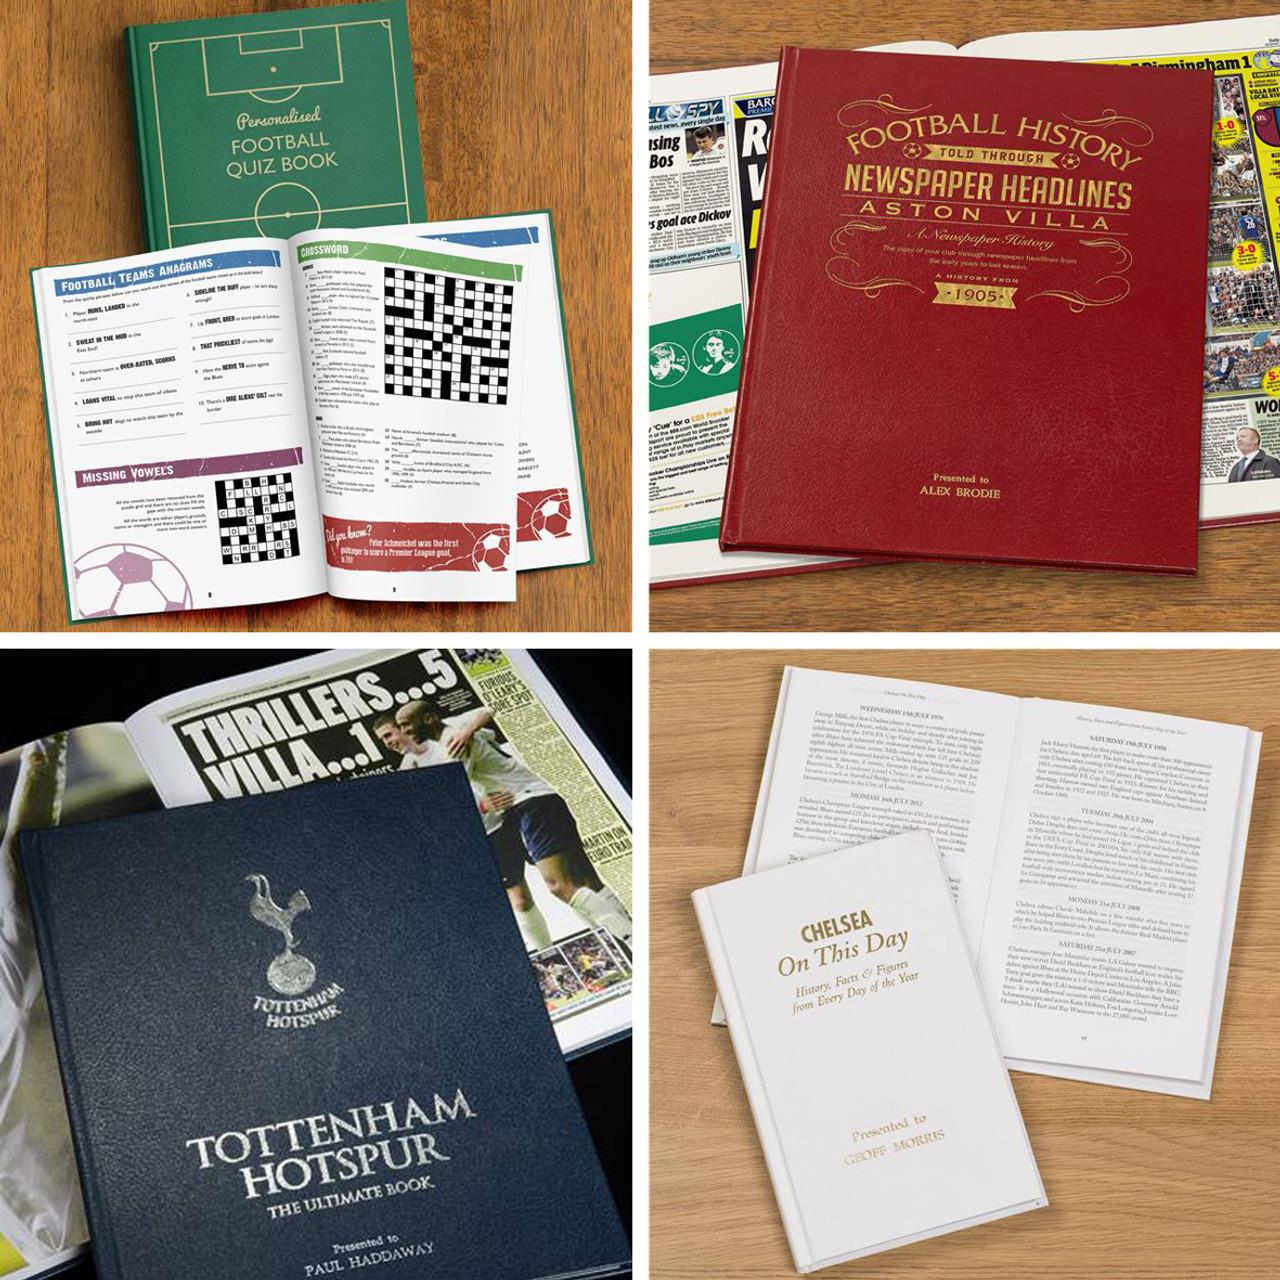 Shop All Football Books